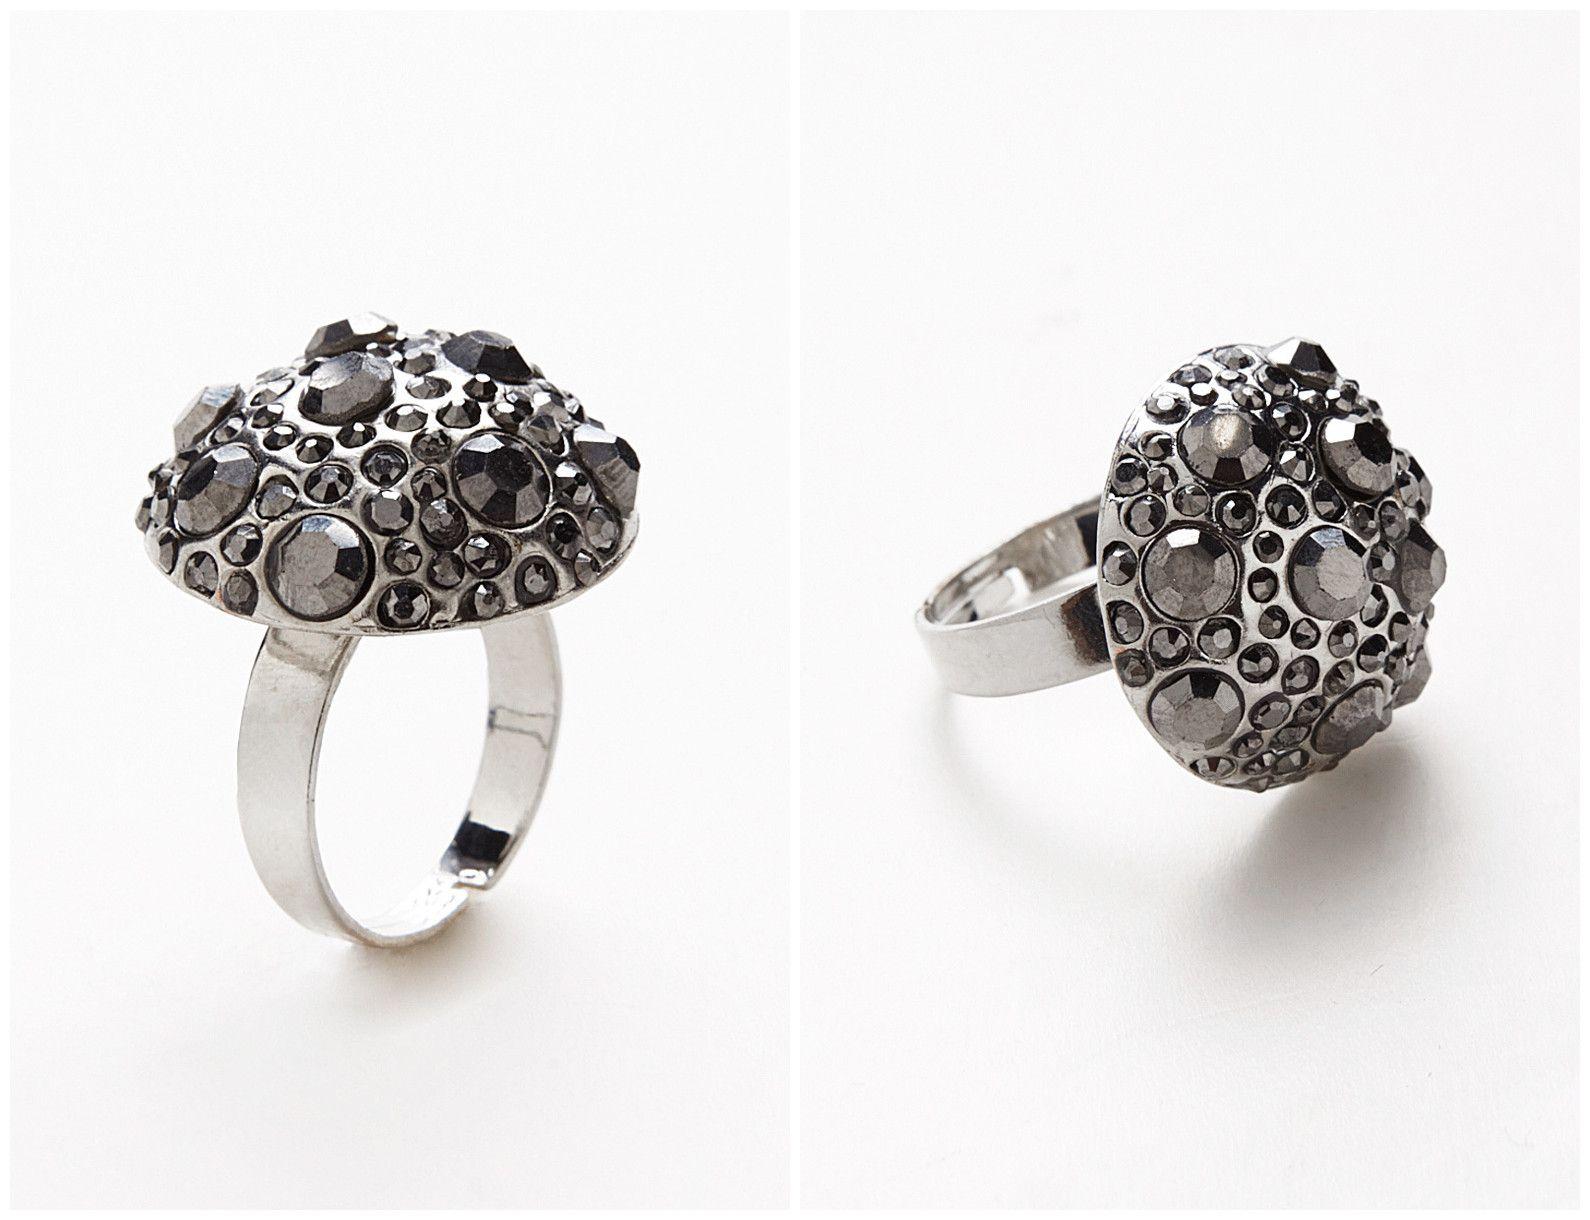 Mushroom Setting Wonderland Silver Gemstone Ring Style Code: 22241 http://www.outerinner.com/mushroom-setting-wonderland-silver-gemstone-ring-pd-22241-70.html